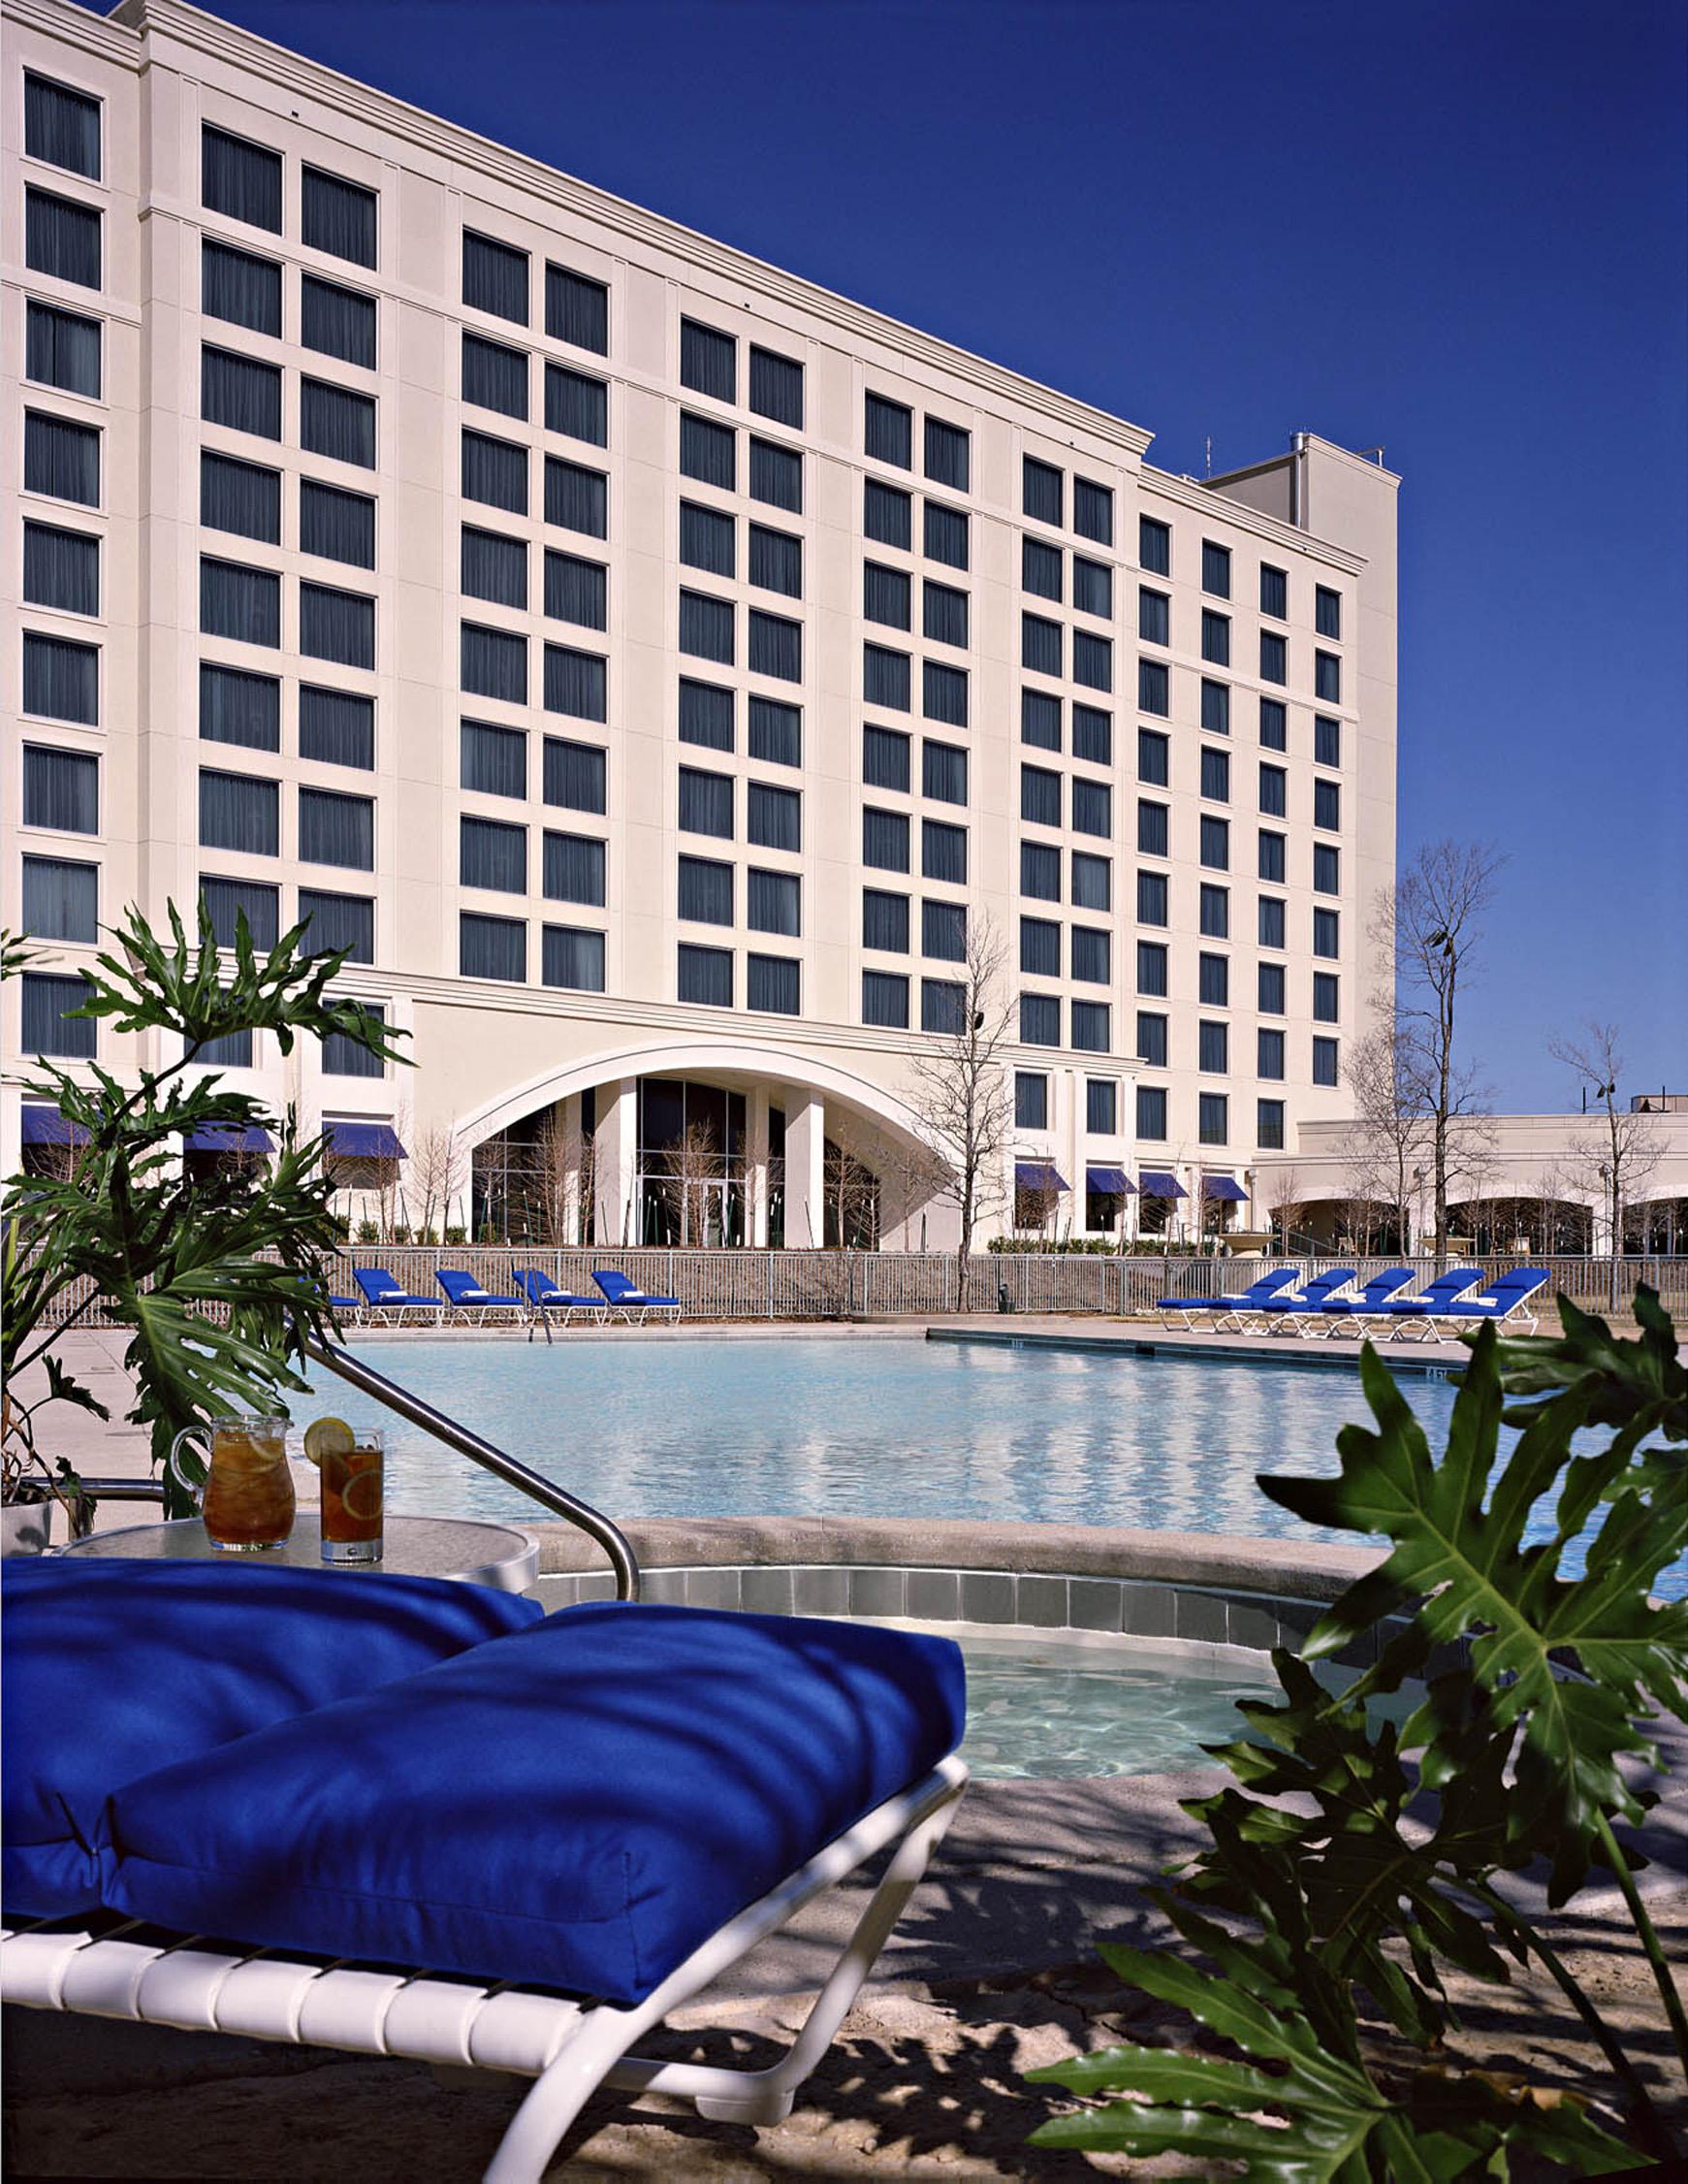 dallas fort worth marriott hotel golf club at champions circle